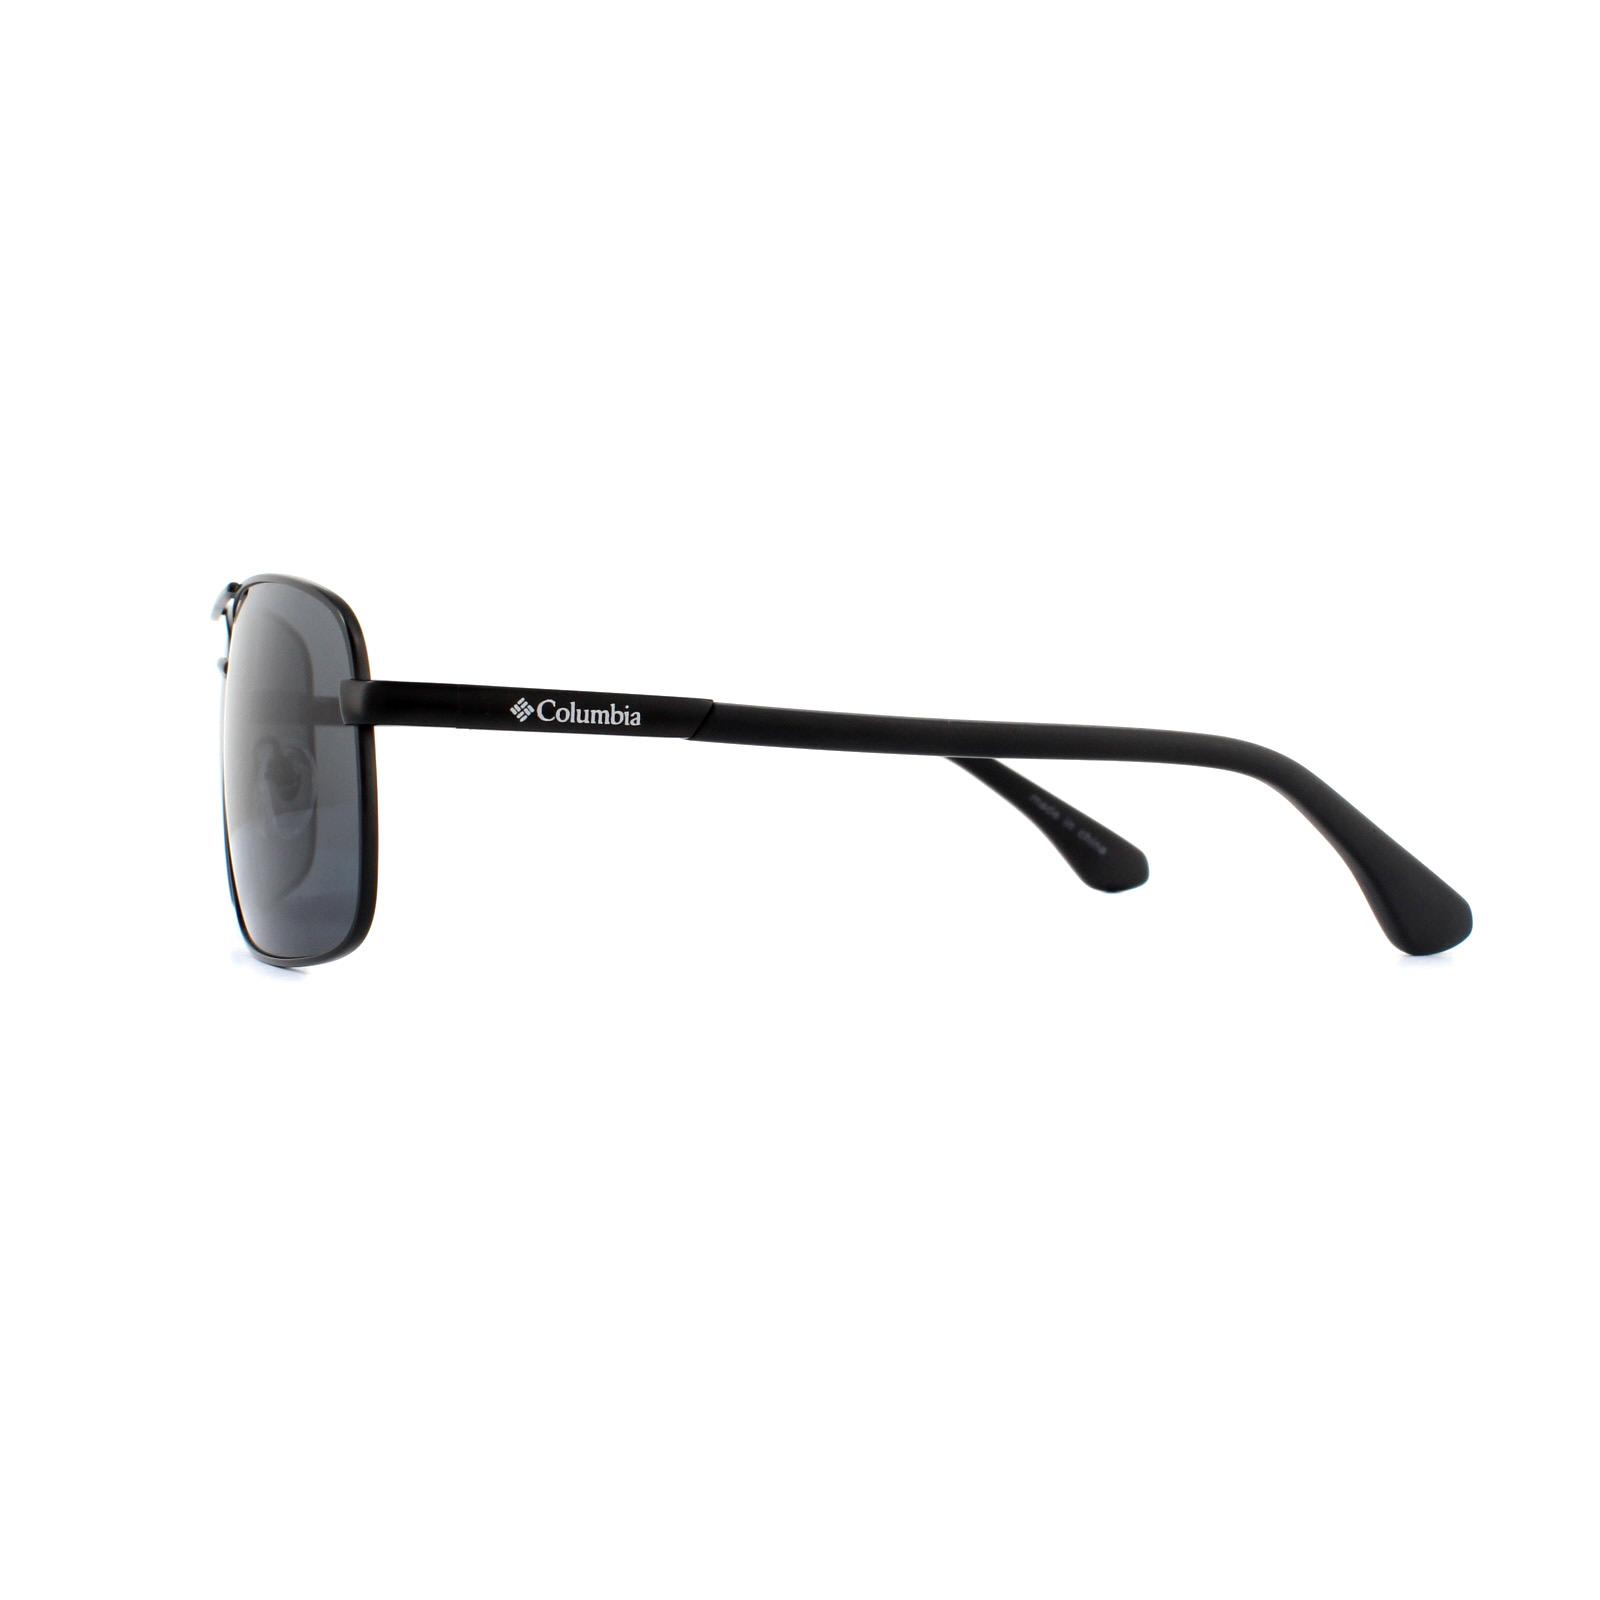 ab54bf9b8d8c Sentinel Columbia Sunglasses CBC805 C02 Matte Black Dark Grey Gradient  Polarized